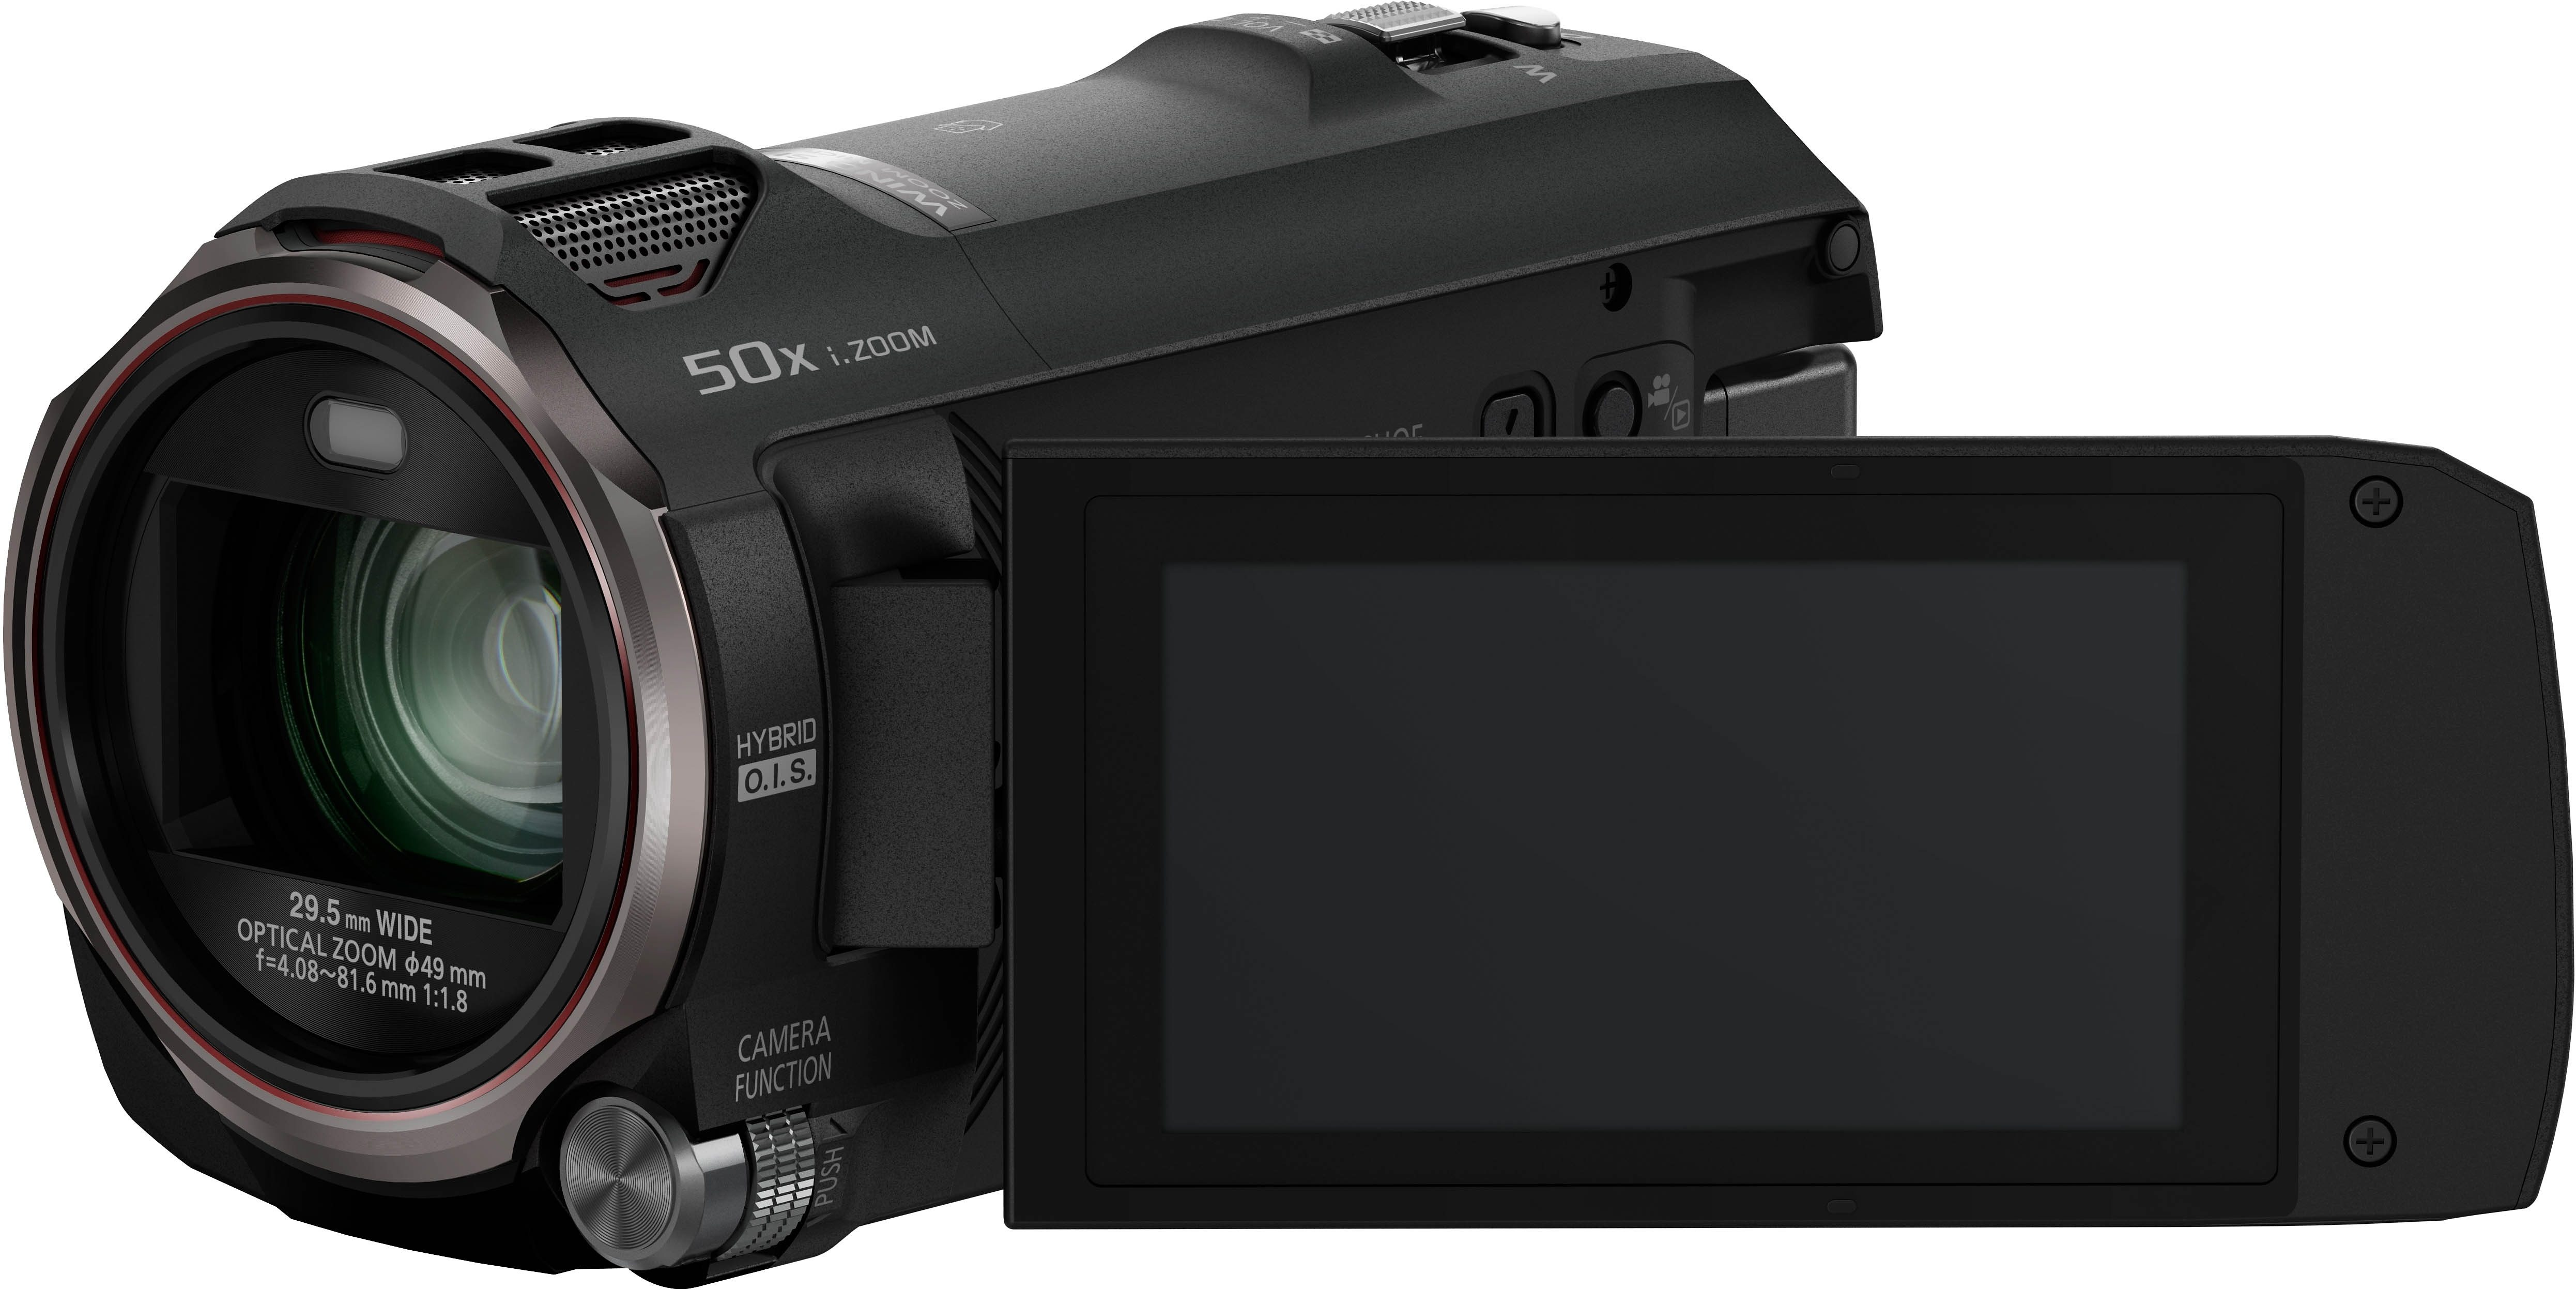 Panasonic HC-V777 1080p (Full HD) Camcorder, Videoleuchte, WLAN, NFC